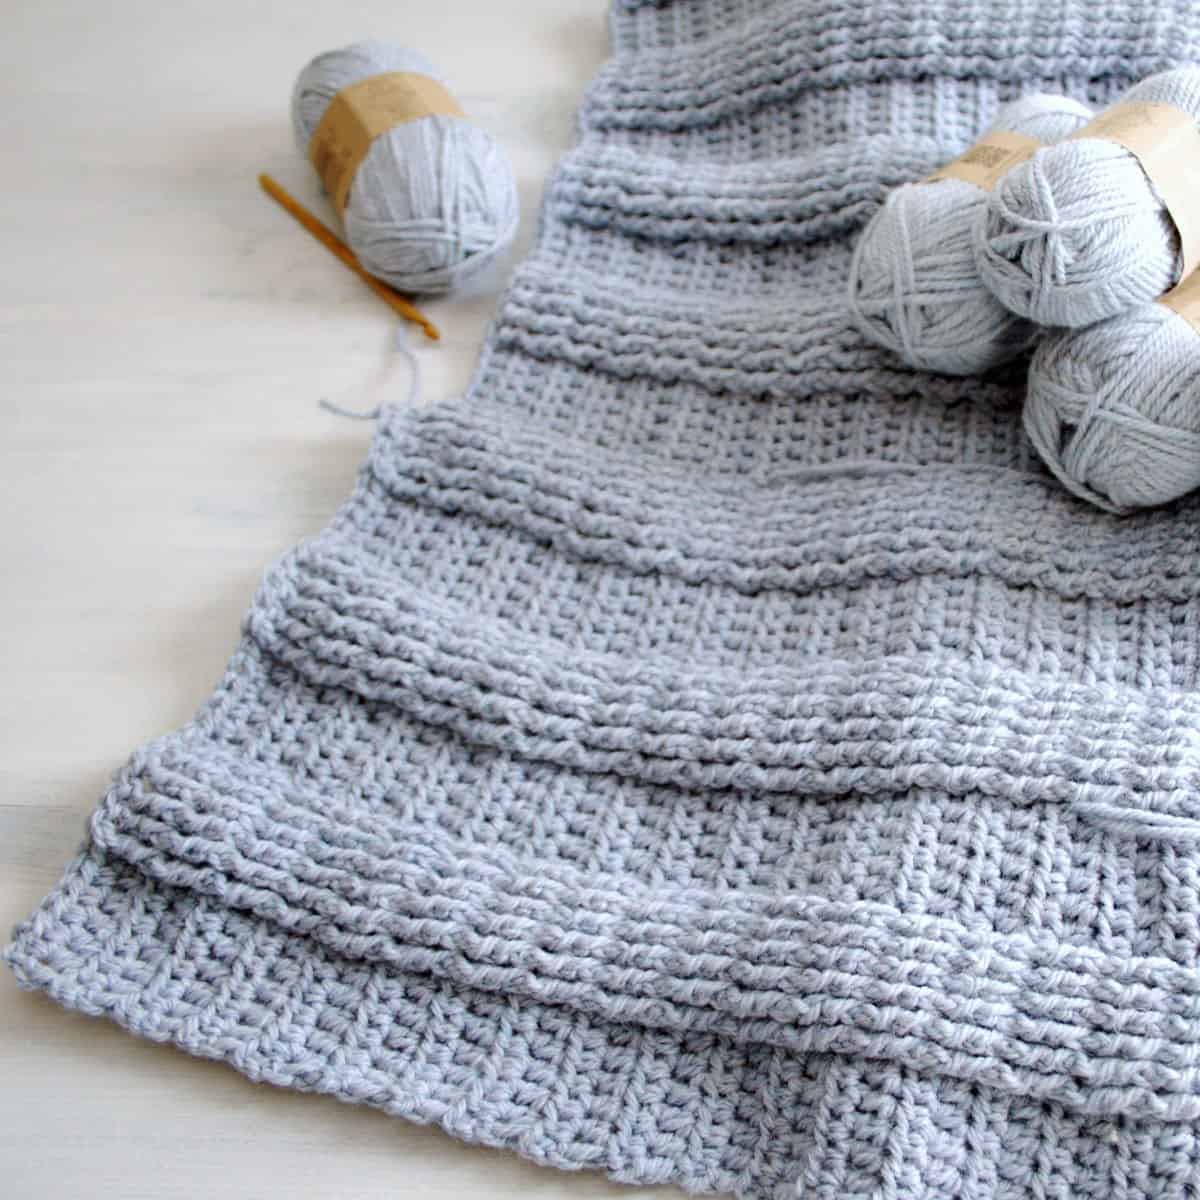 Berry Hedge Ribbed Crochet Blanket Work in Progress.